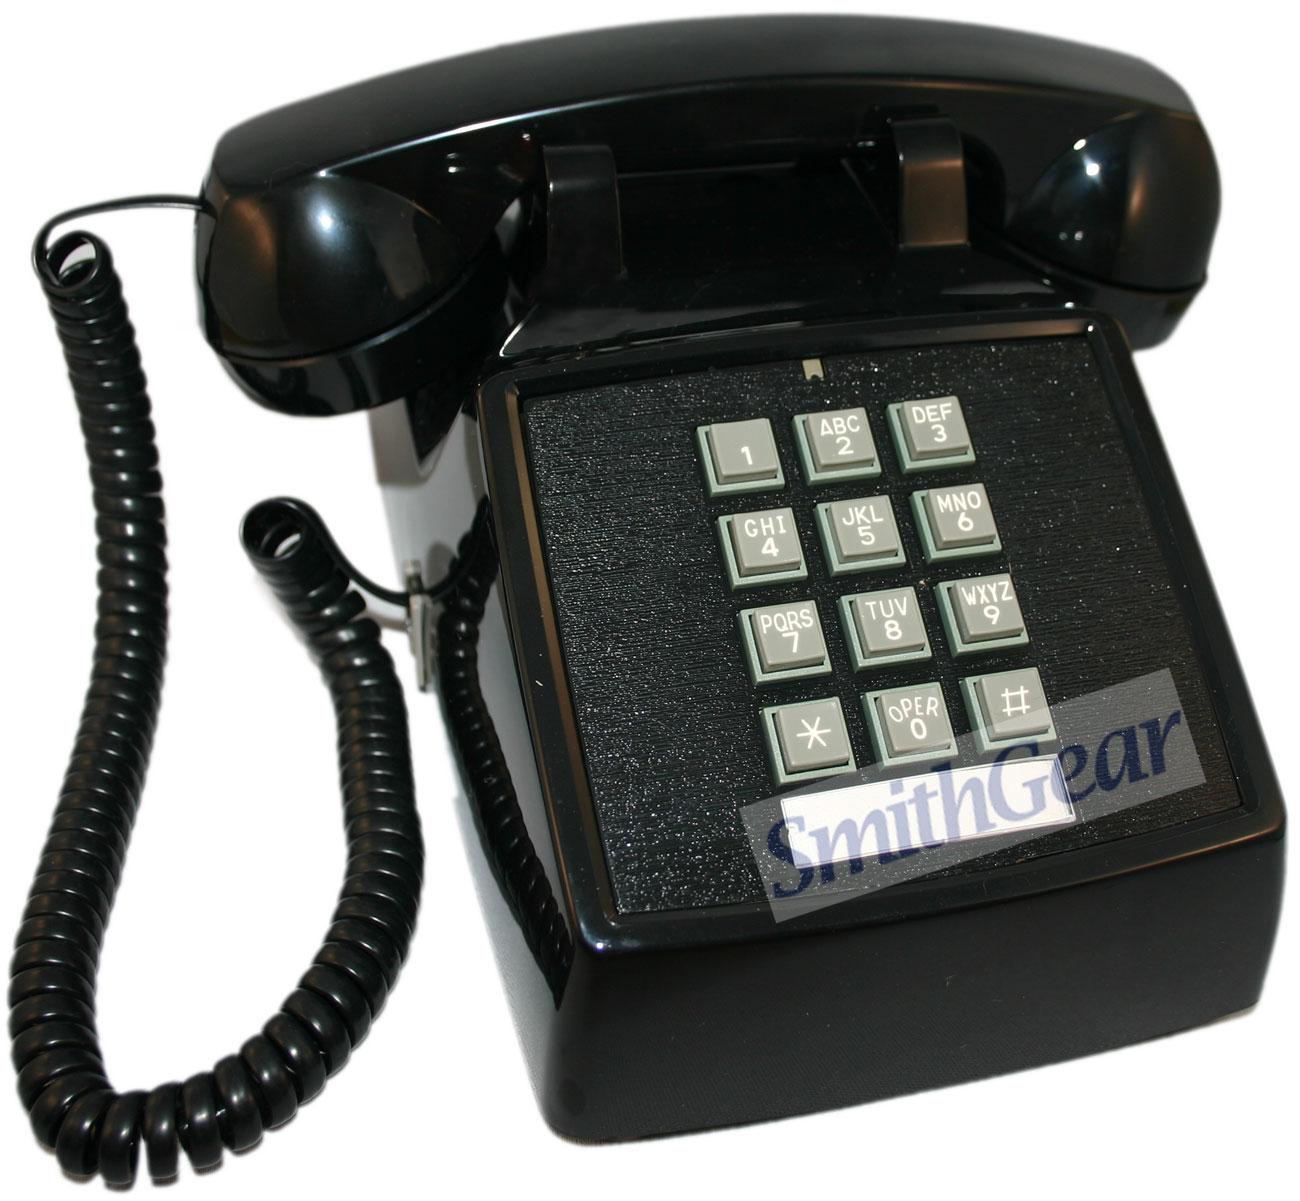 Rotary phone ringer problem DoItYourself munity